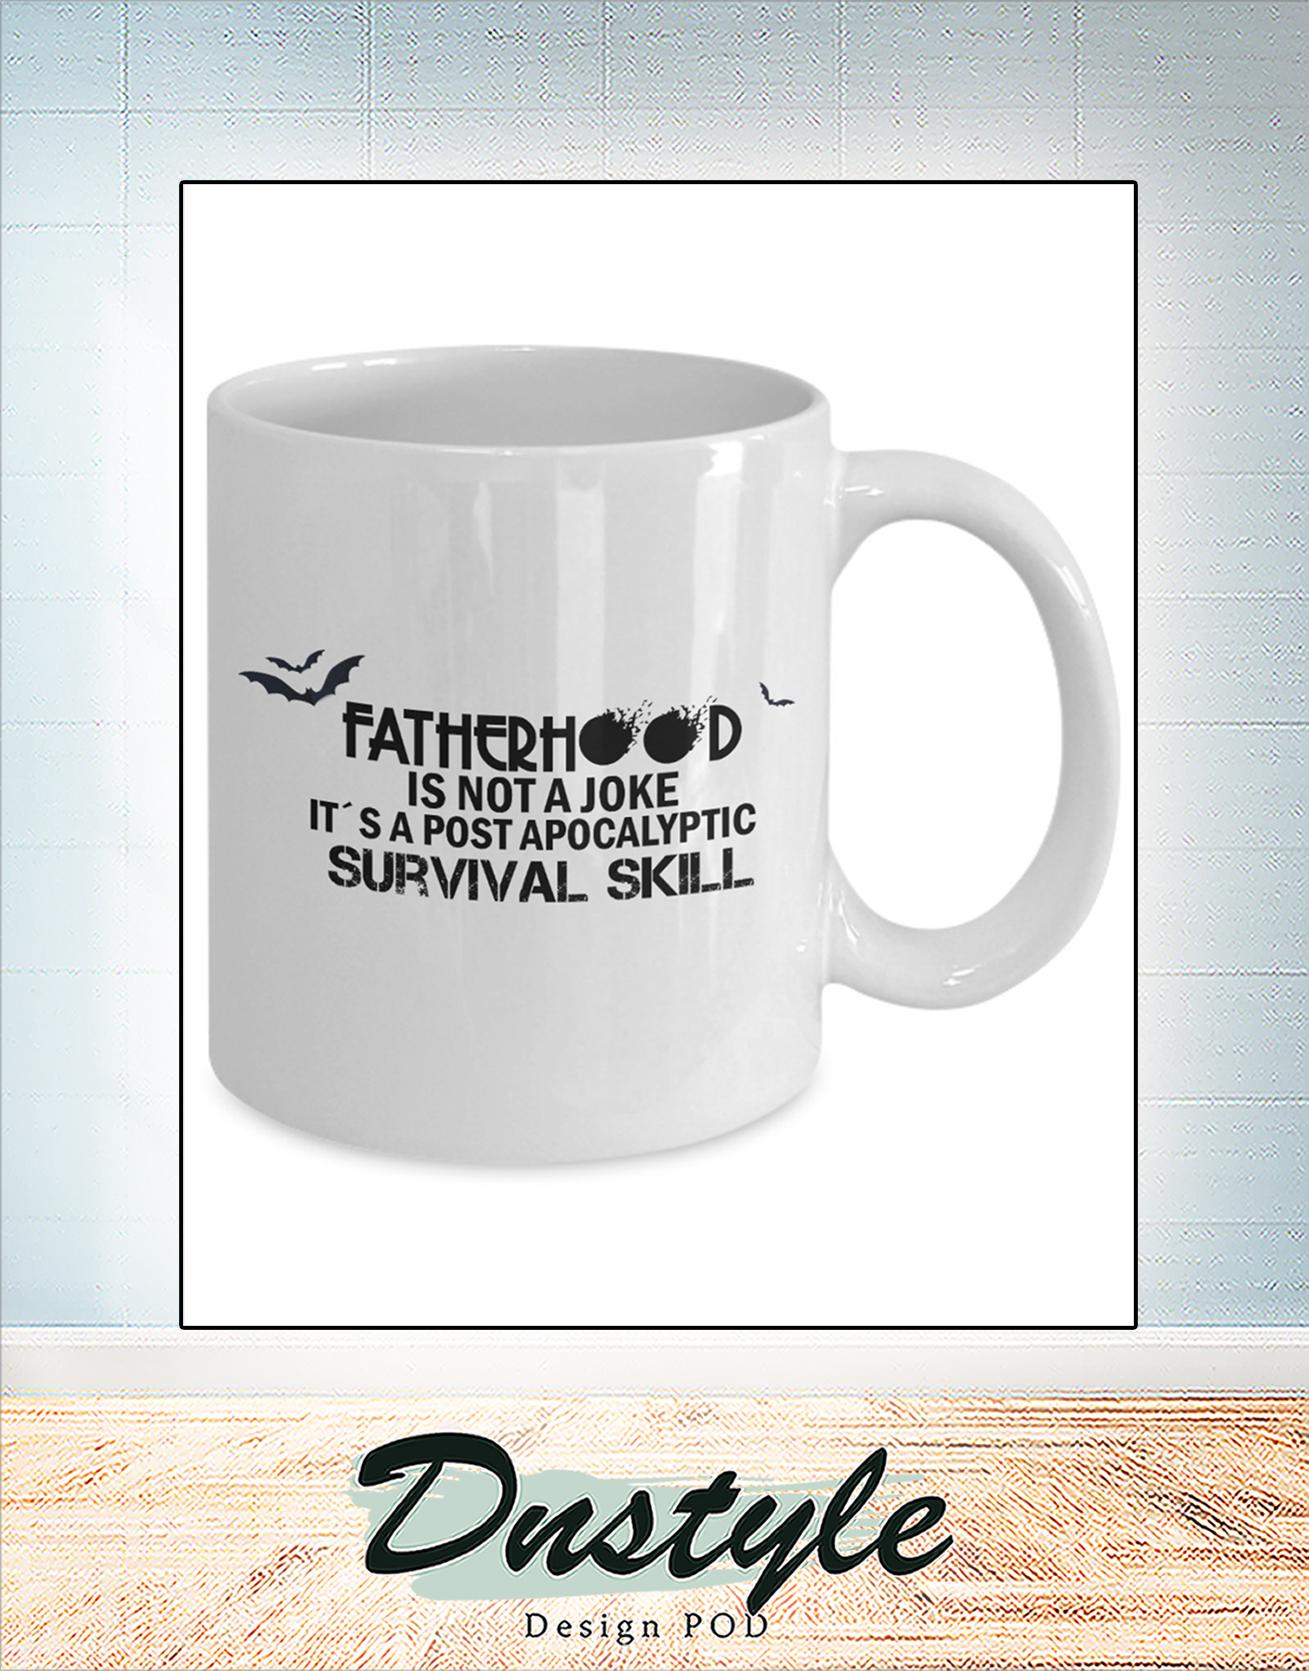 Fatherhood is not a joke mug 1